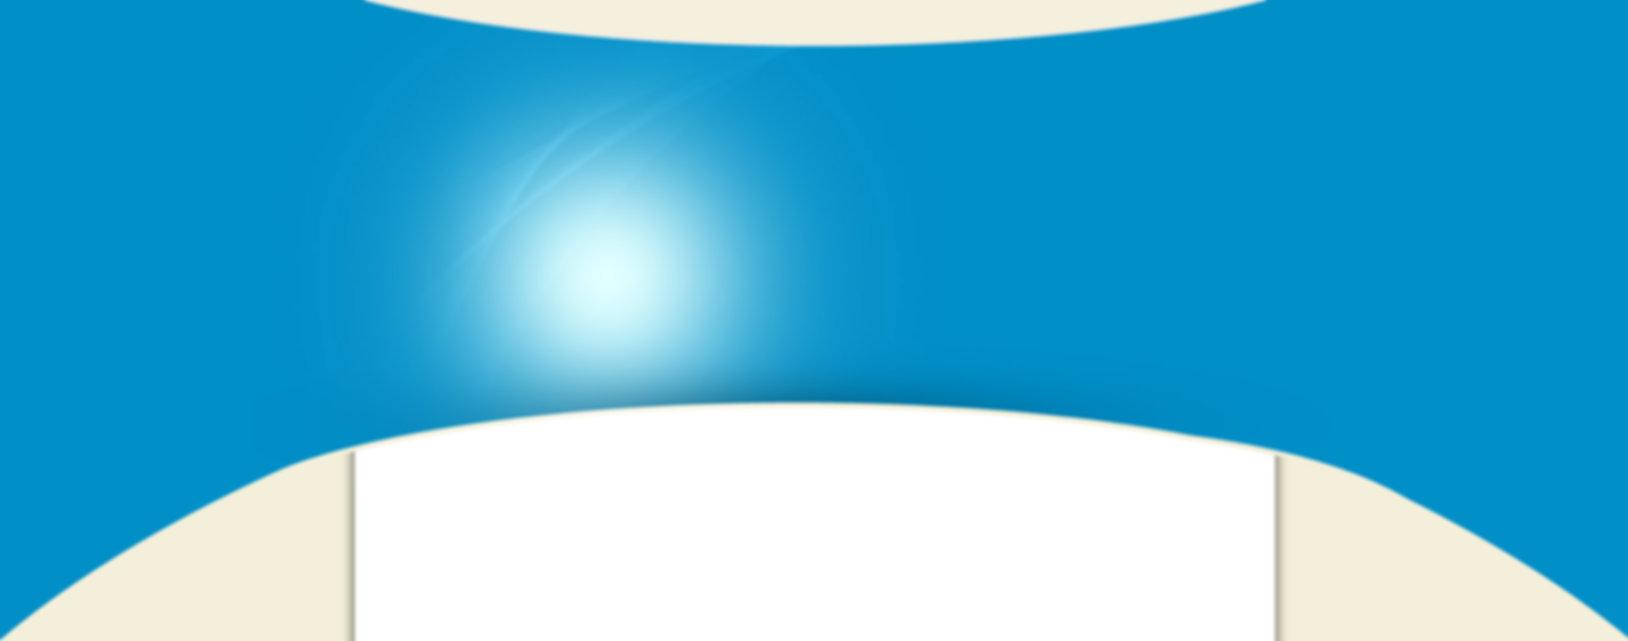 homepage-body_bg.jpg